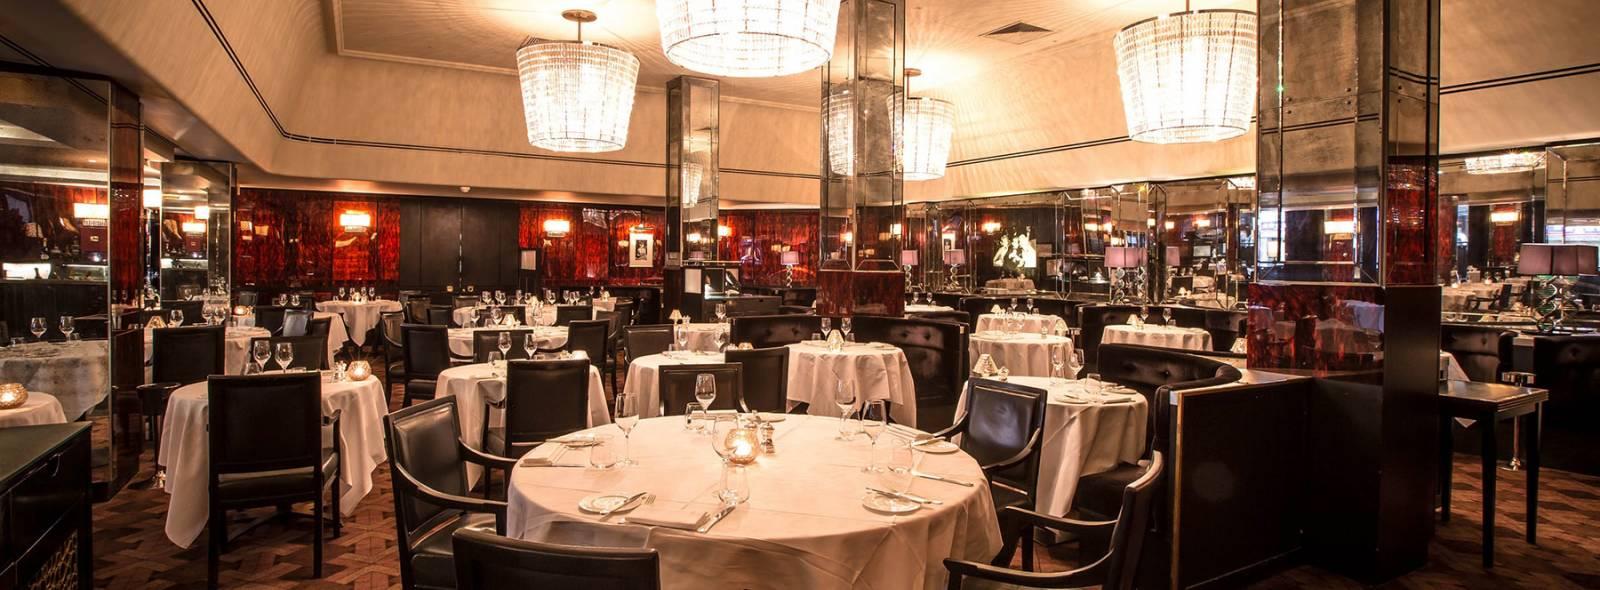 Savoy Grill Kitchen Table